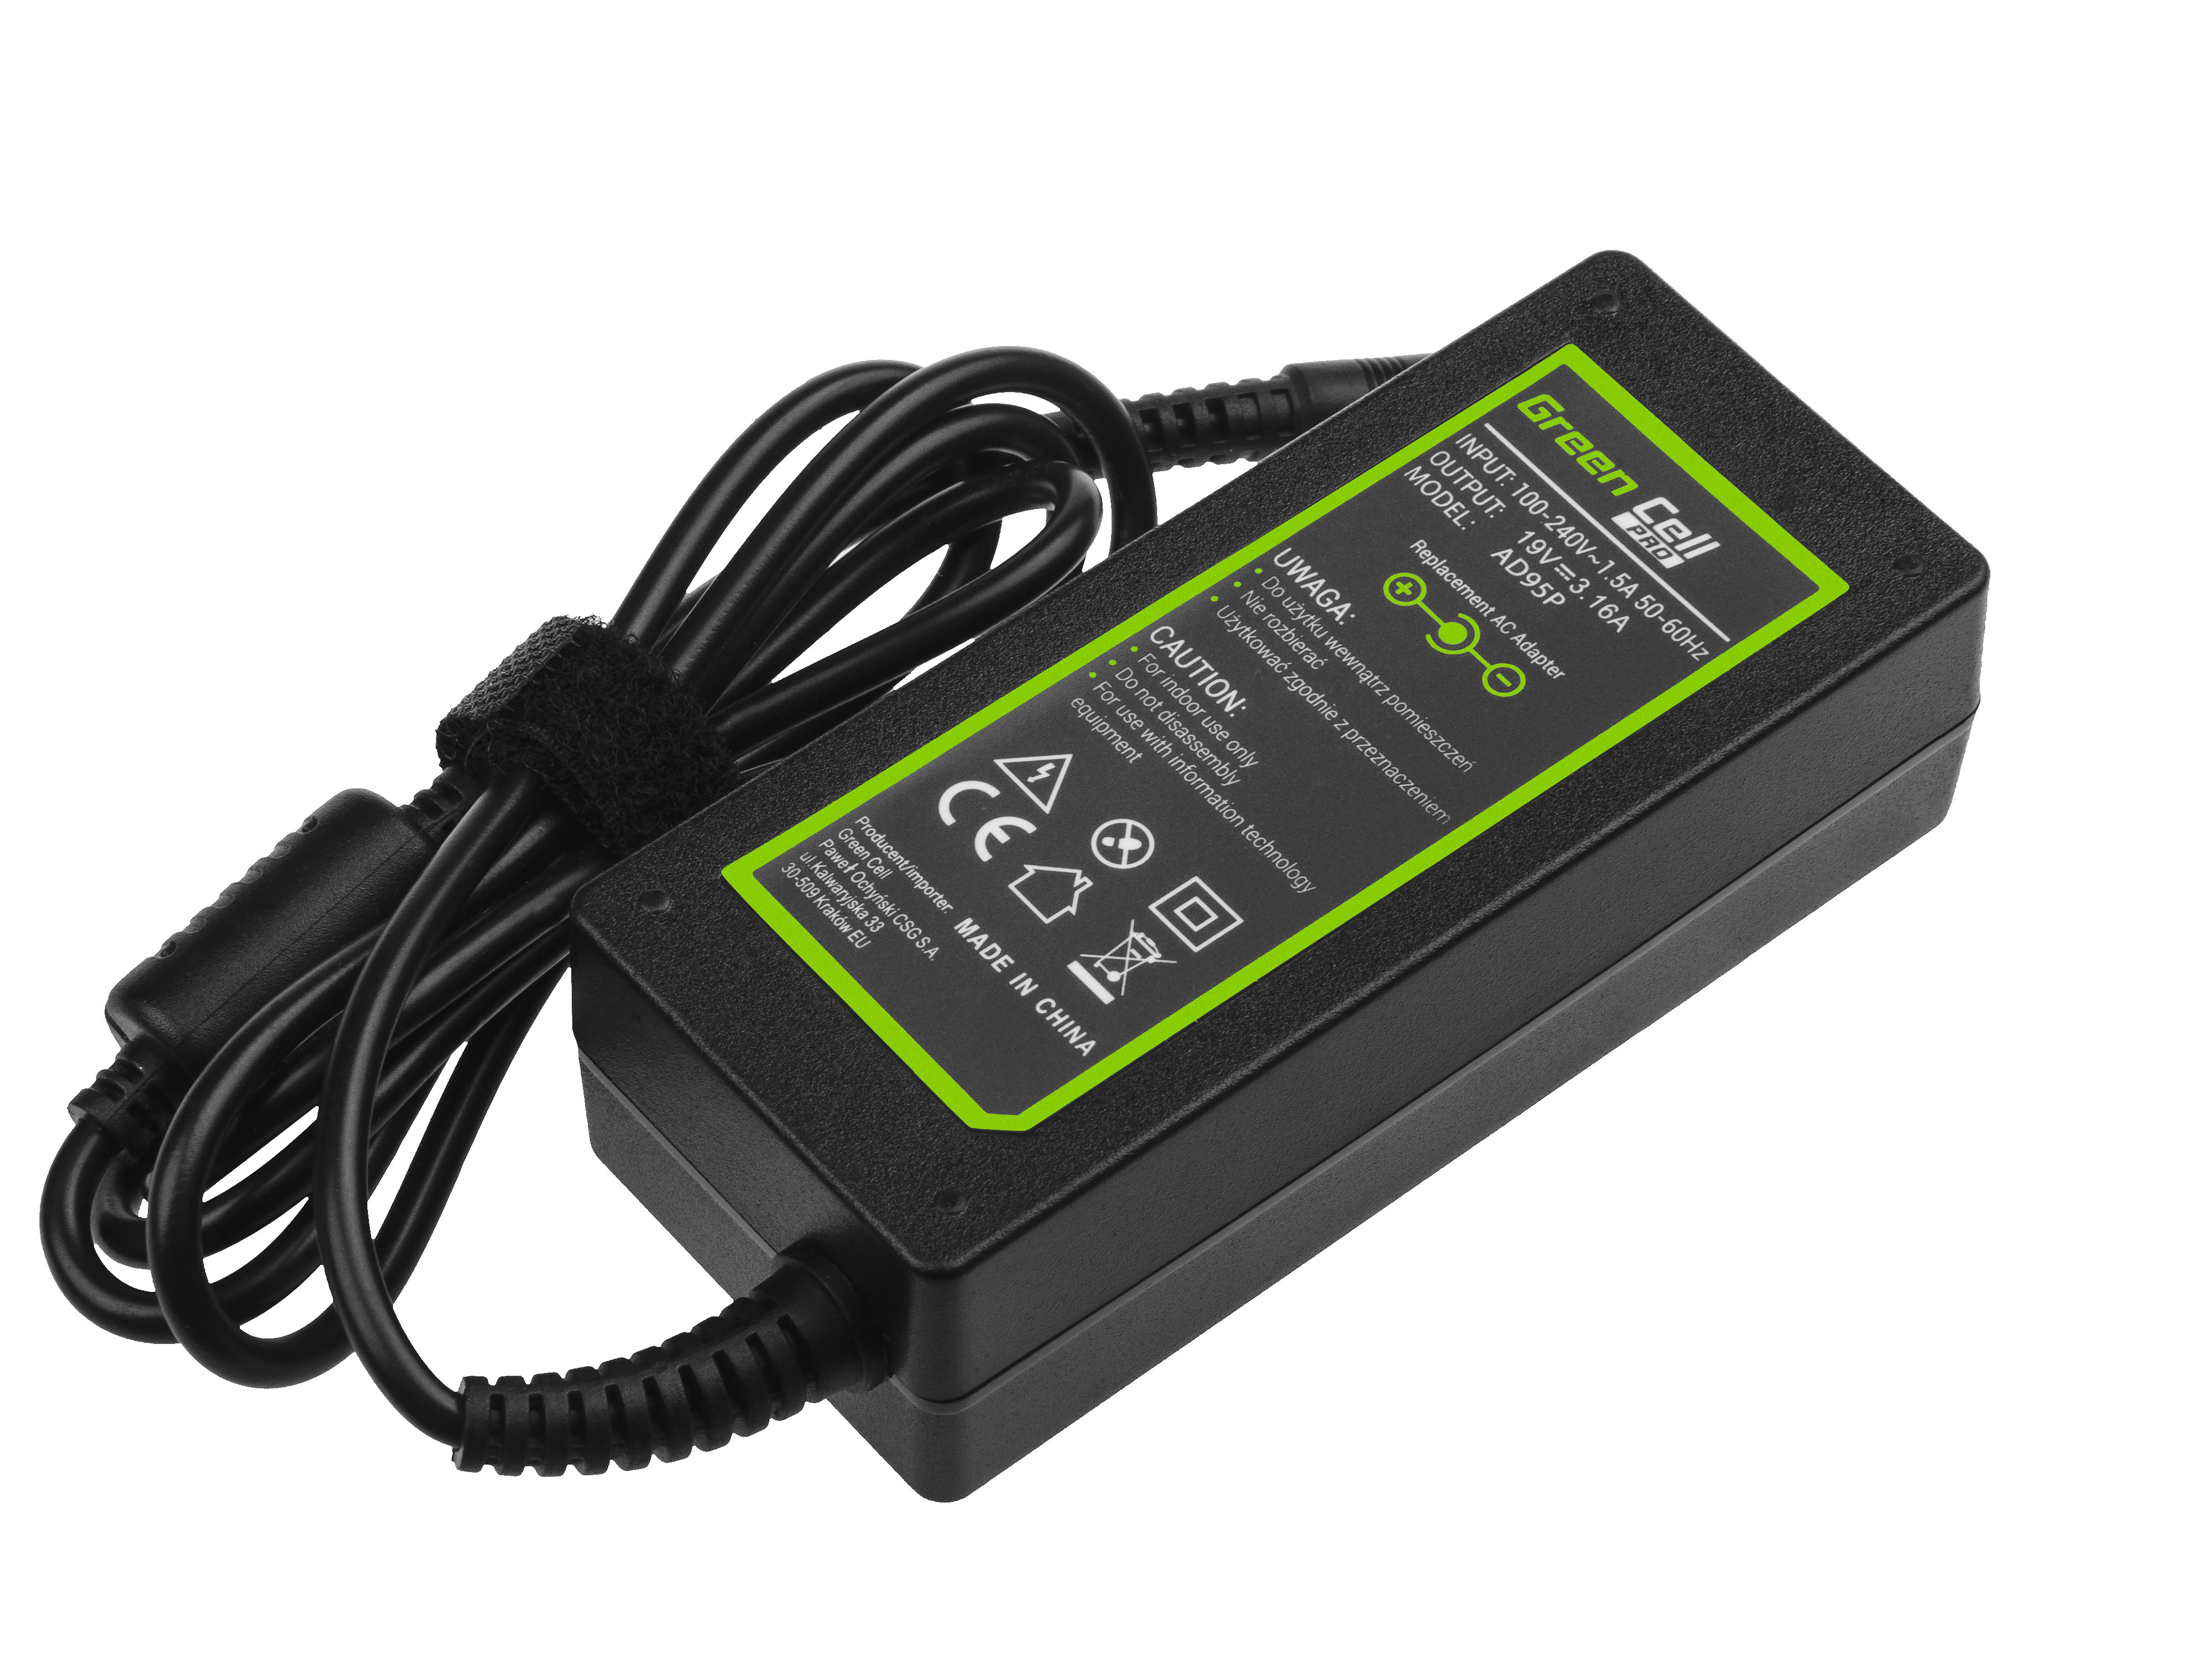 Green Cell AD95P Nabíječka adaptér Samsung NP730U3E ATIV 5 NP530U4E ATIV Book 7 NP740U3E 19V 3,16A 60 W